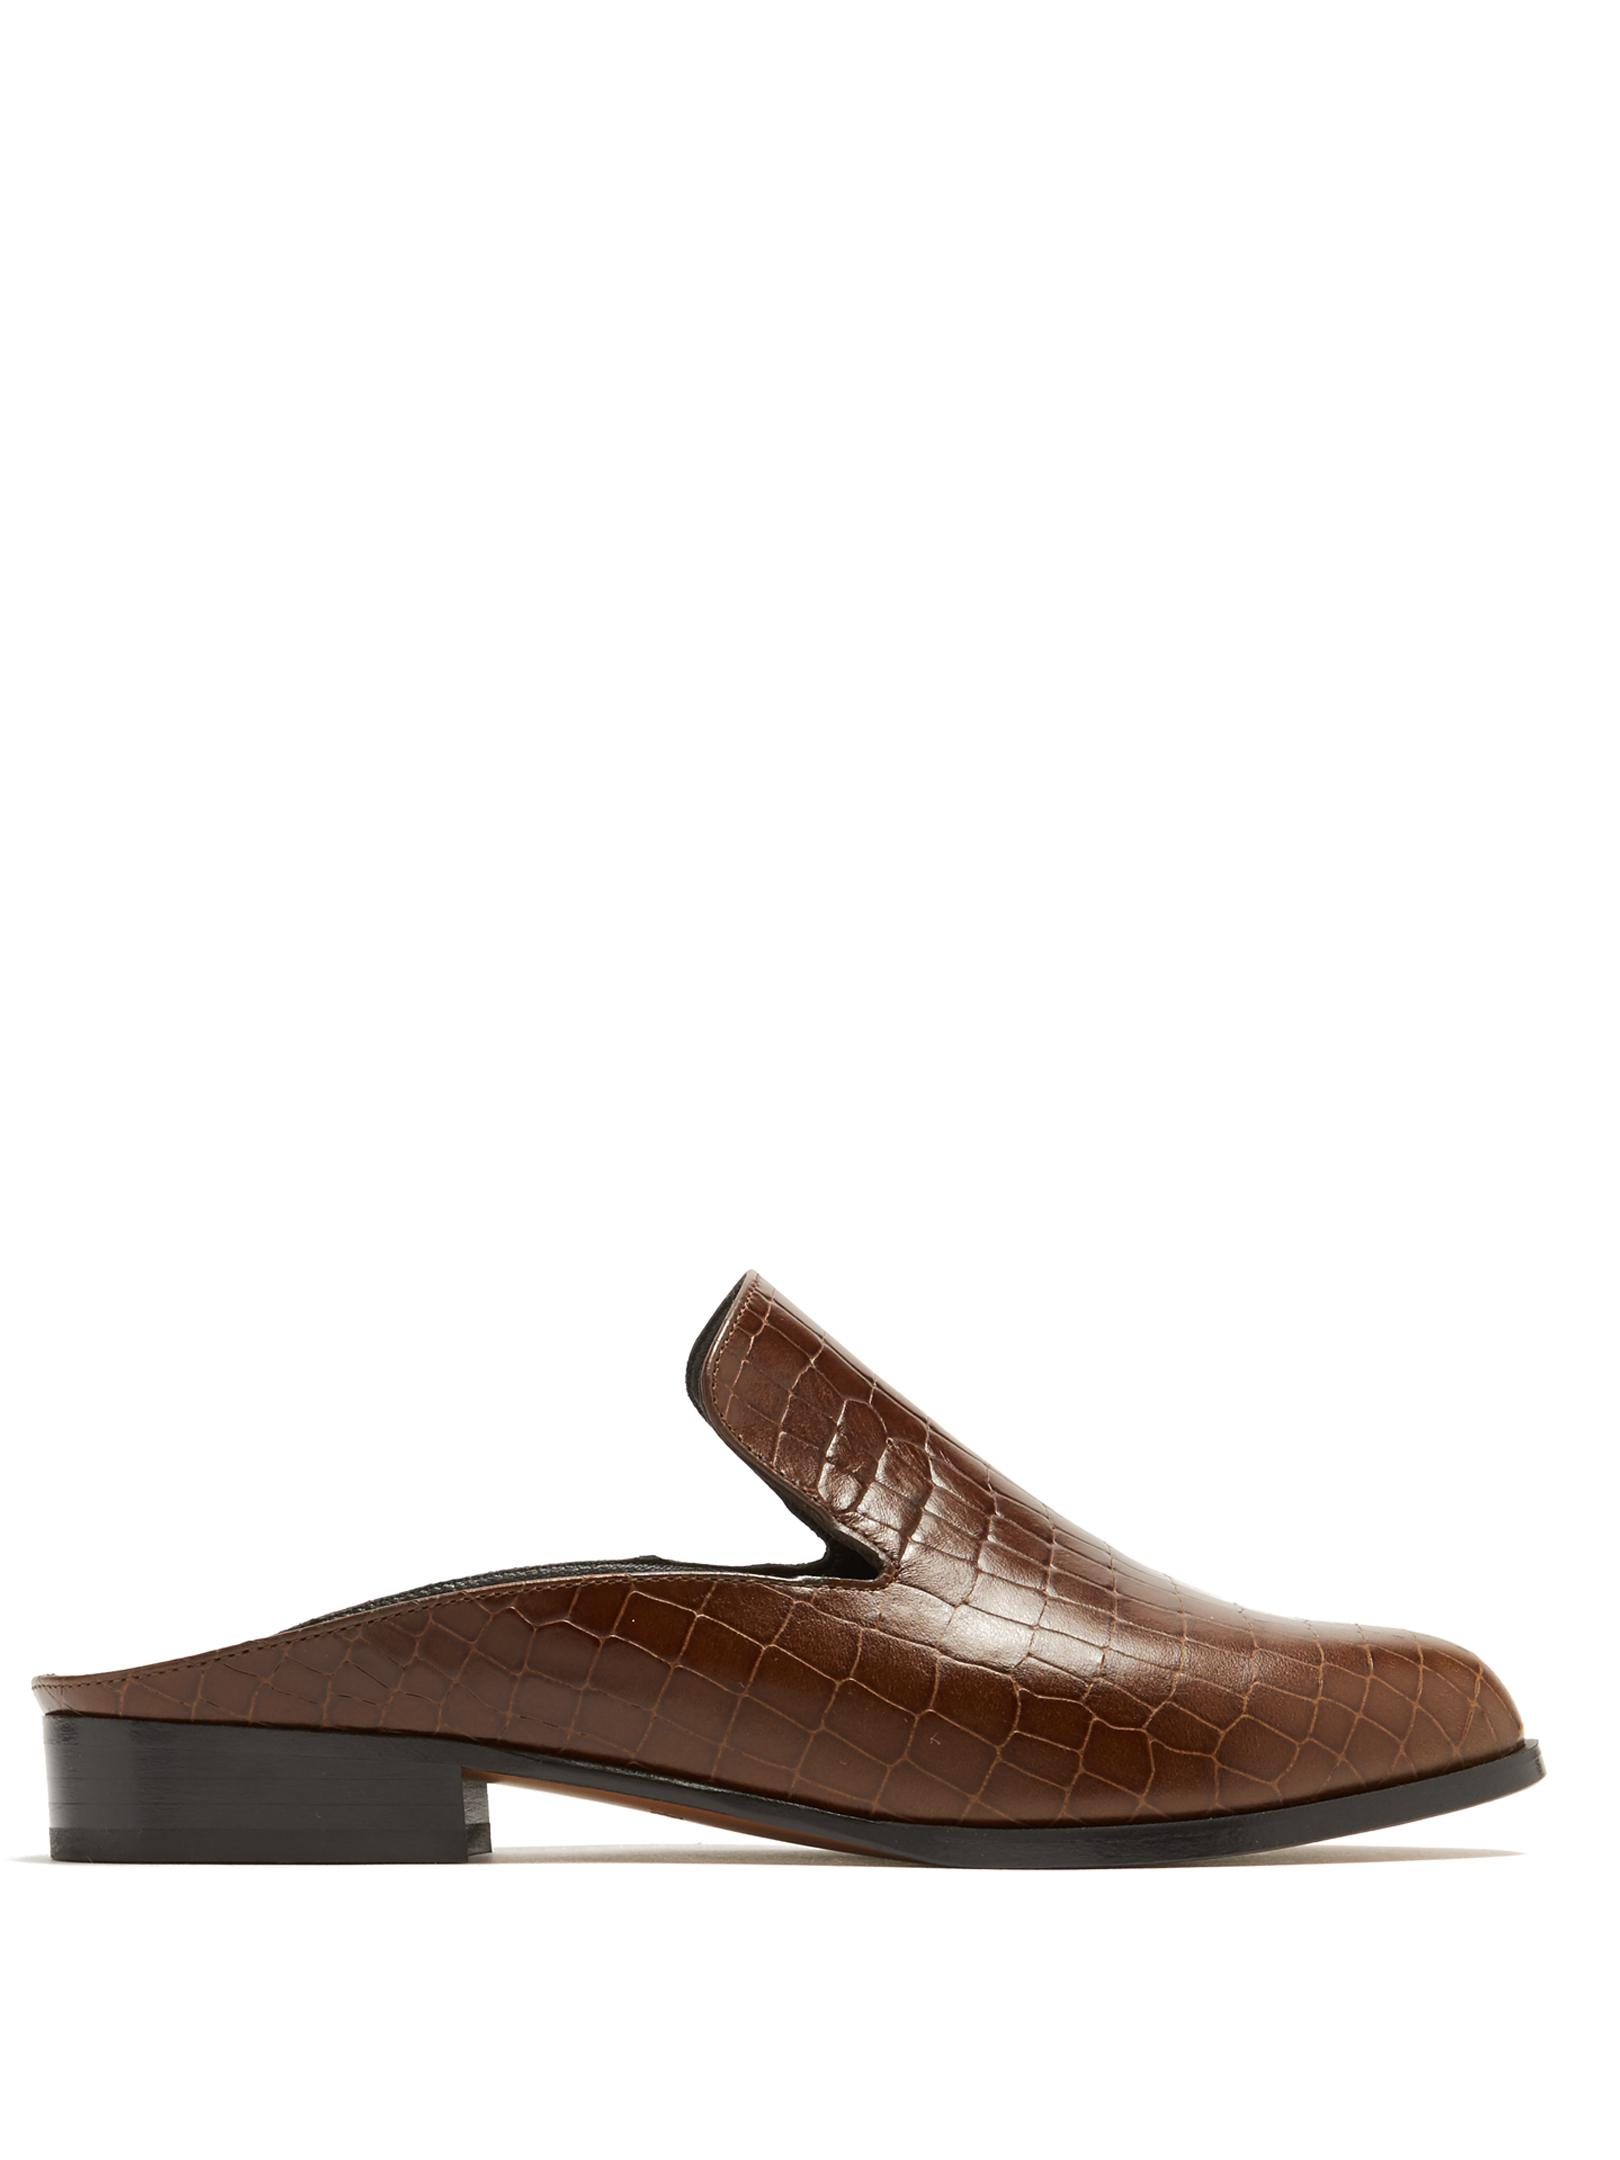 Lynn platform loafers - Black Robert Clergerie GhGDClkUFO